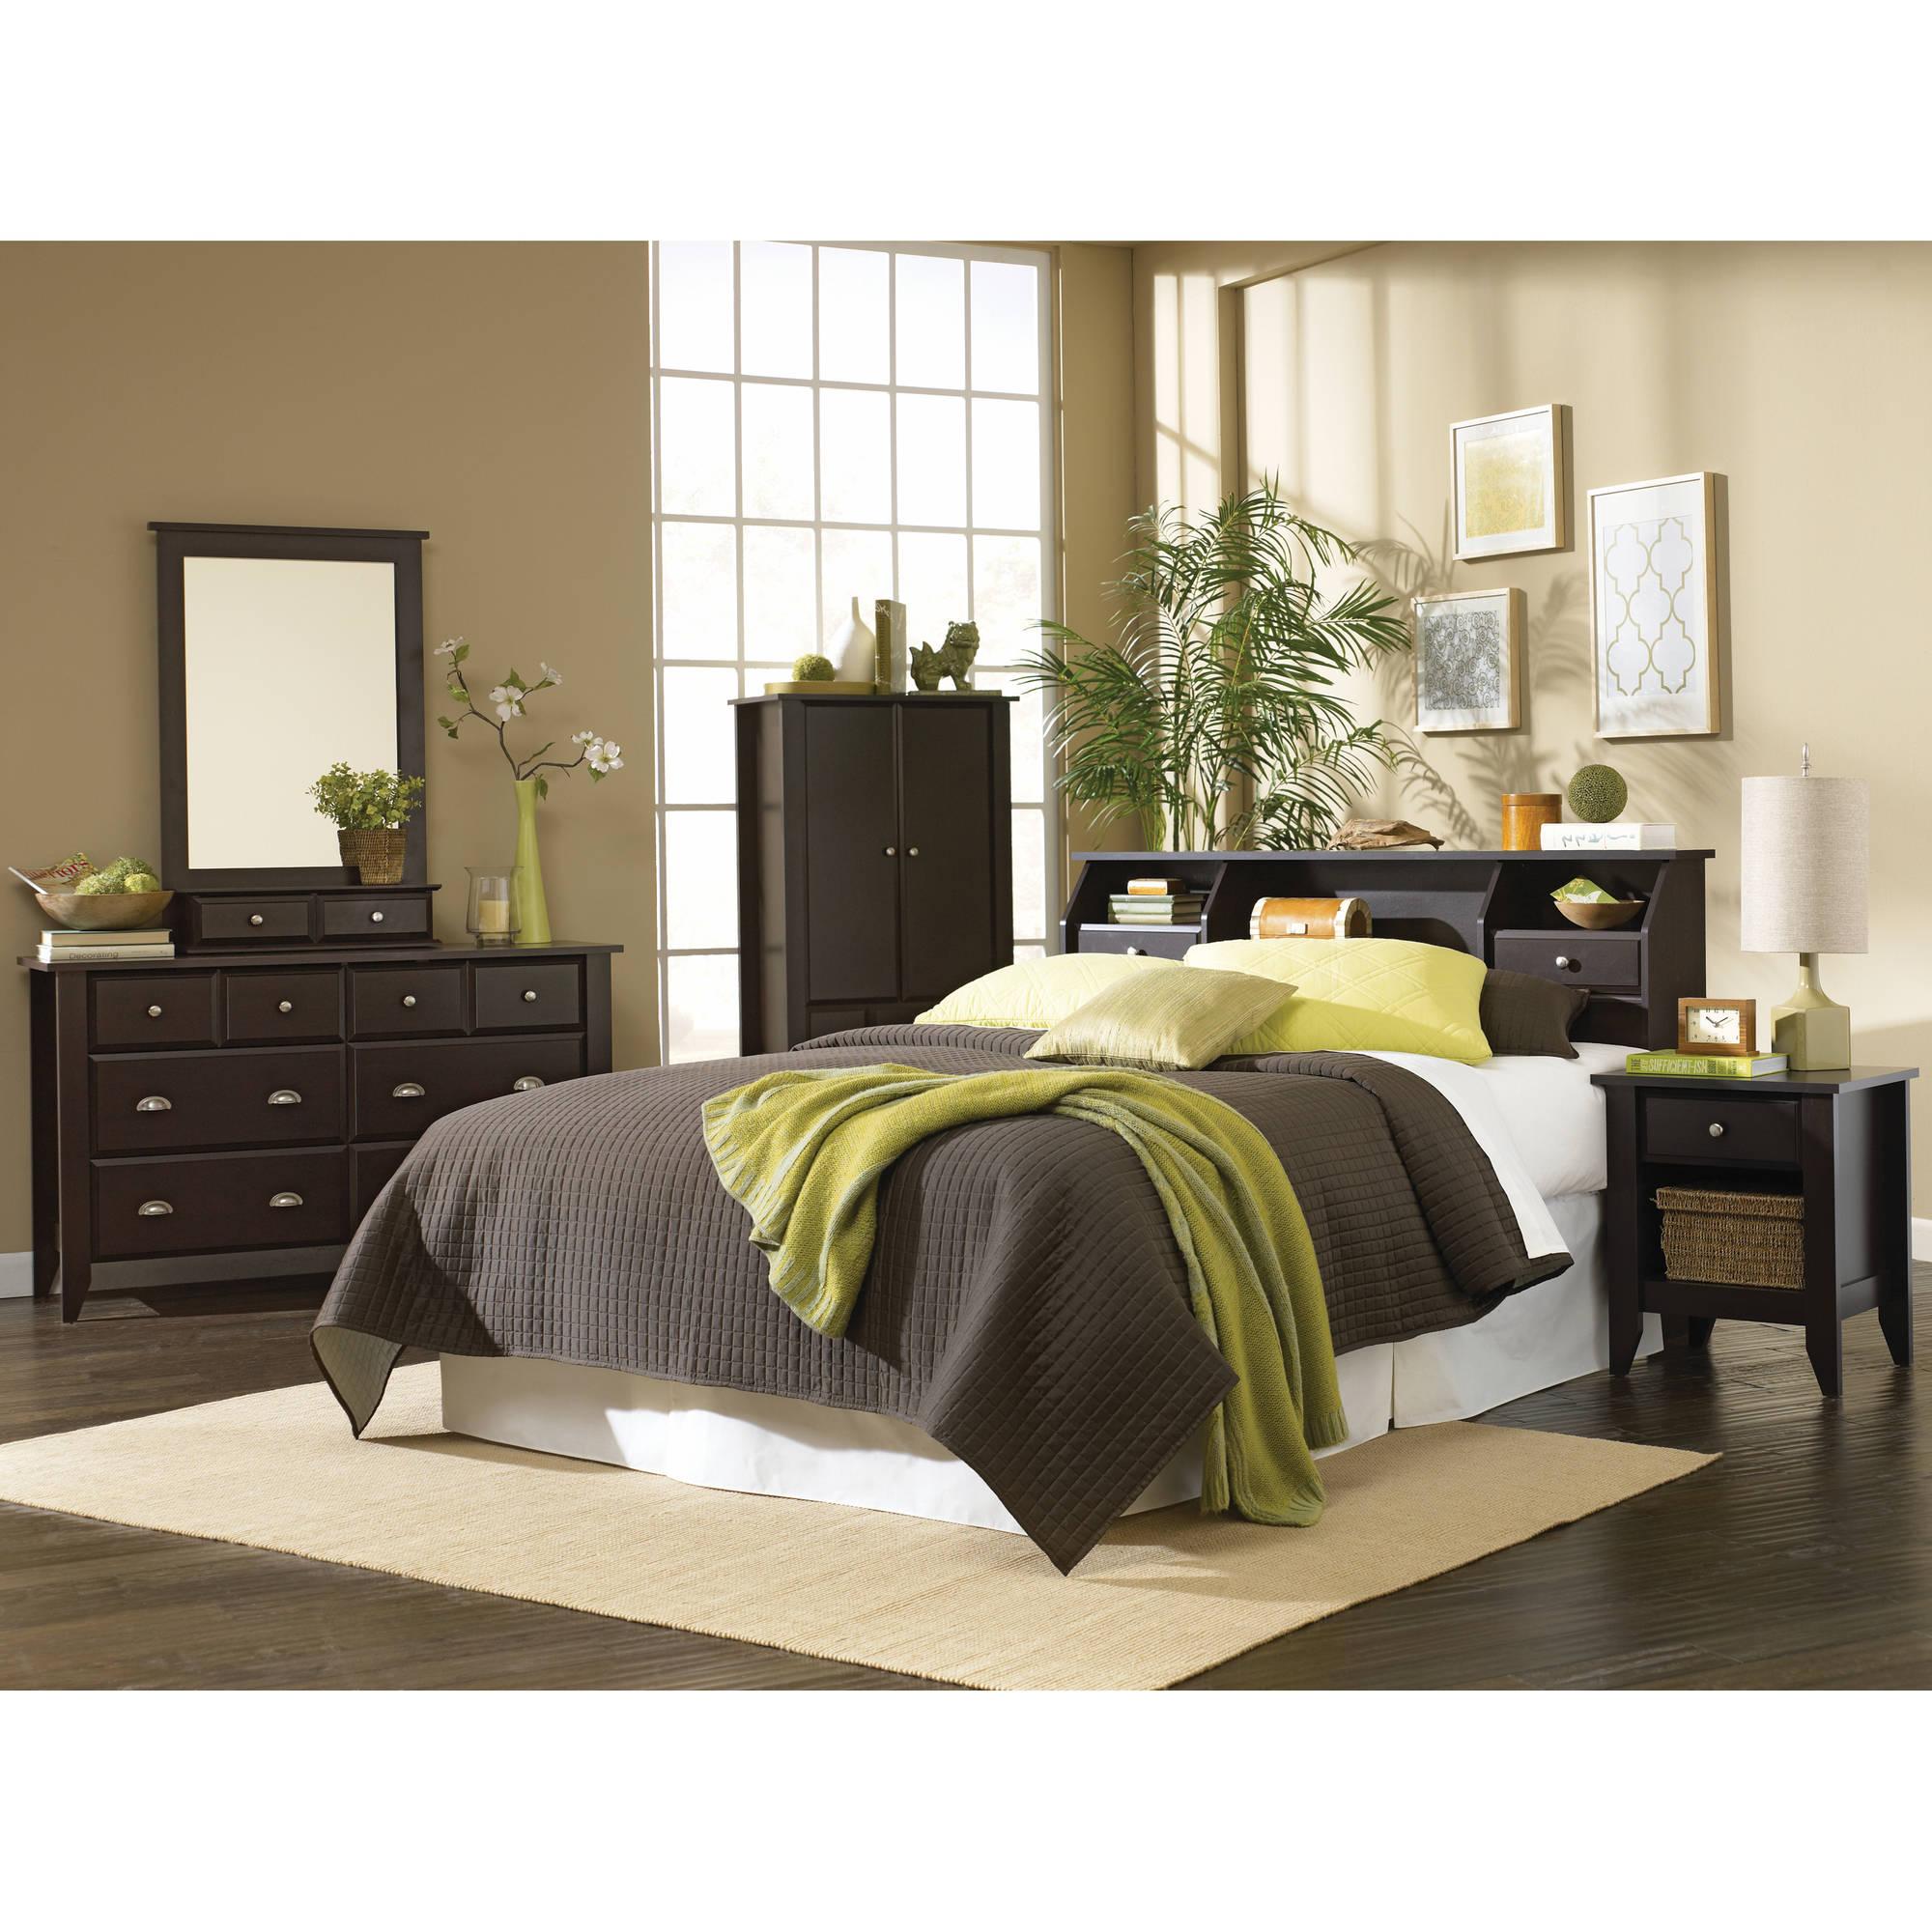 Sauder Shoal Creek Bedroom Furniture Collection Walmart